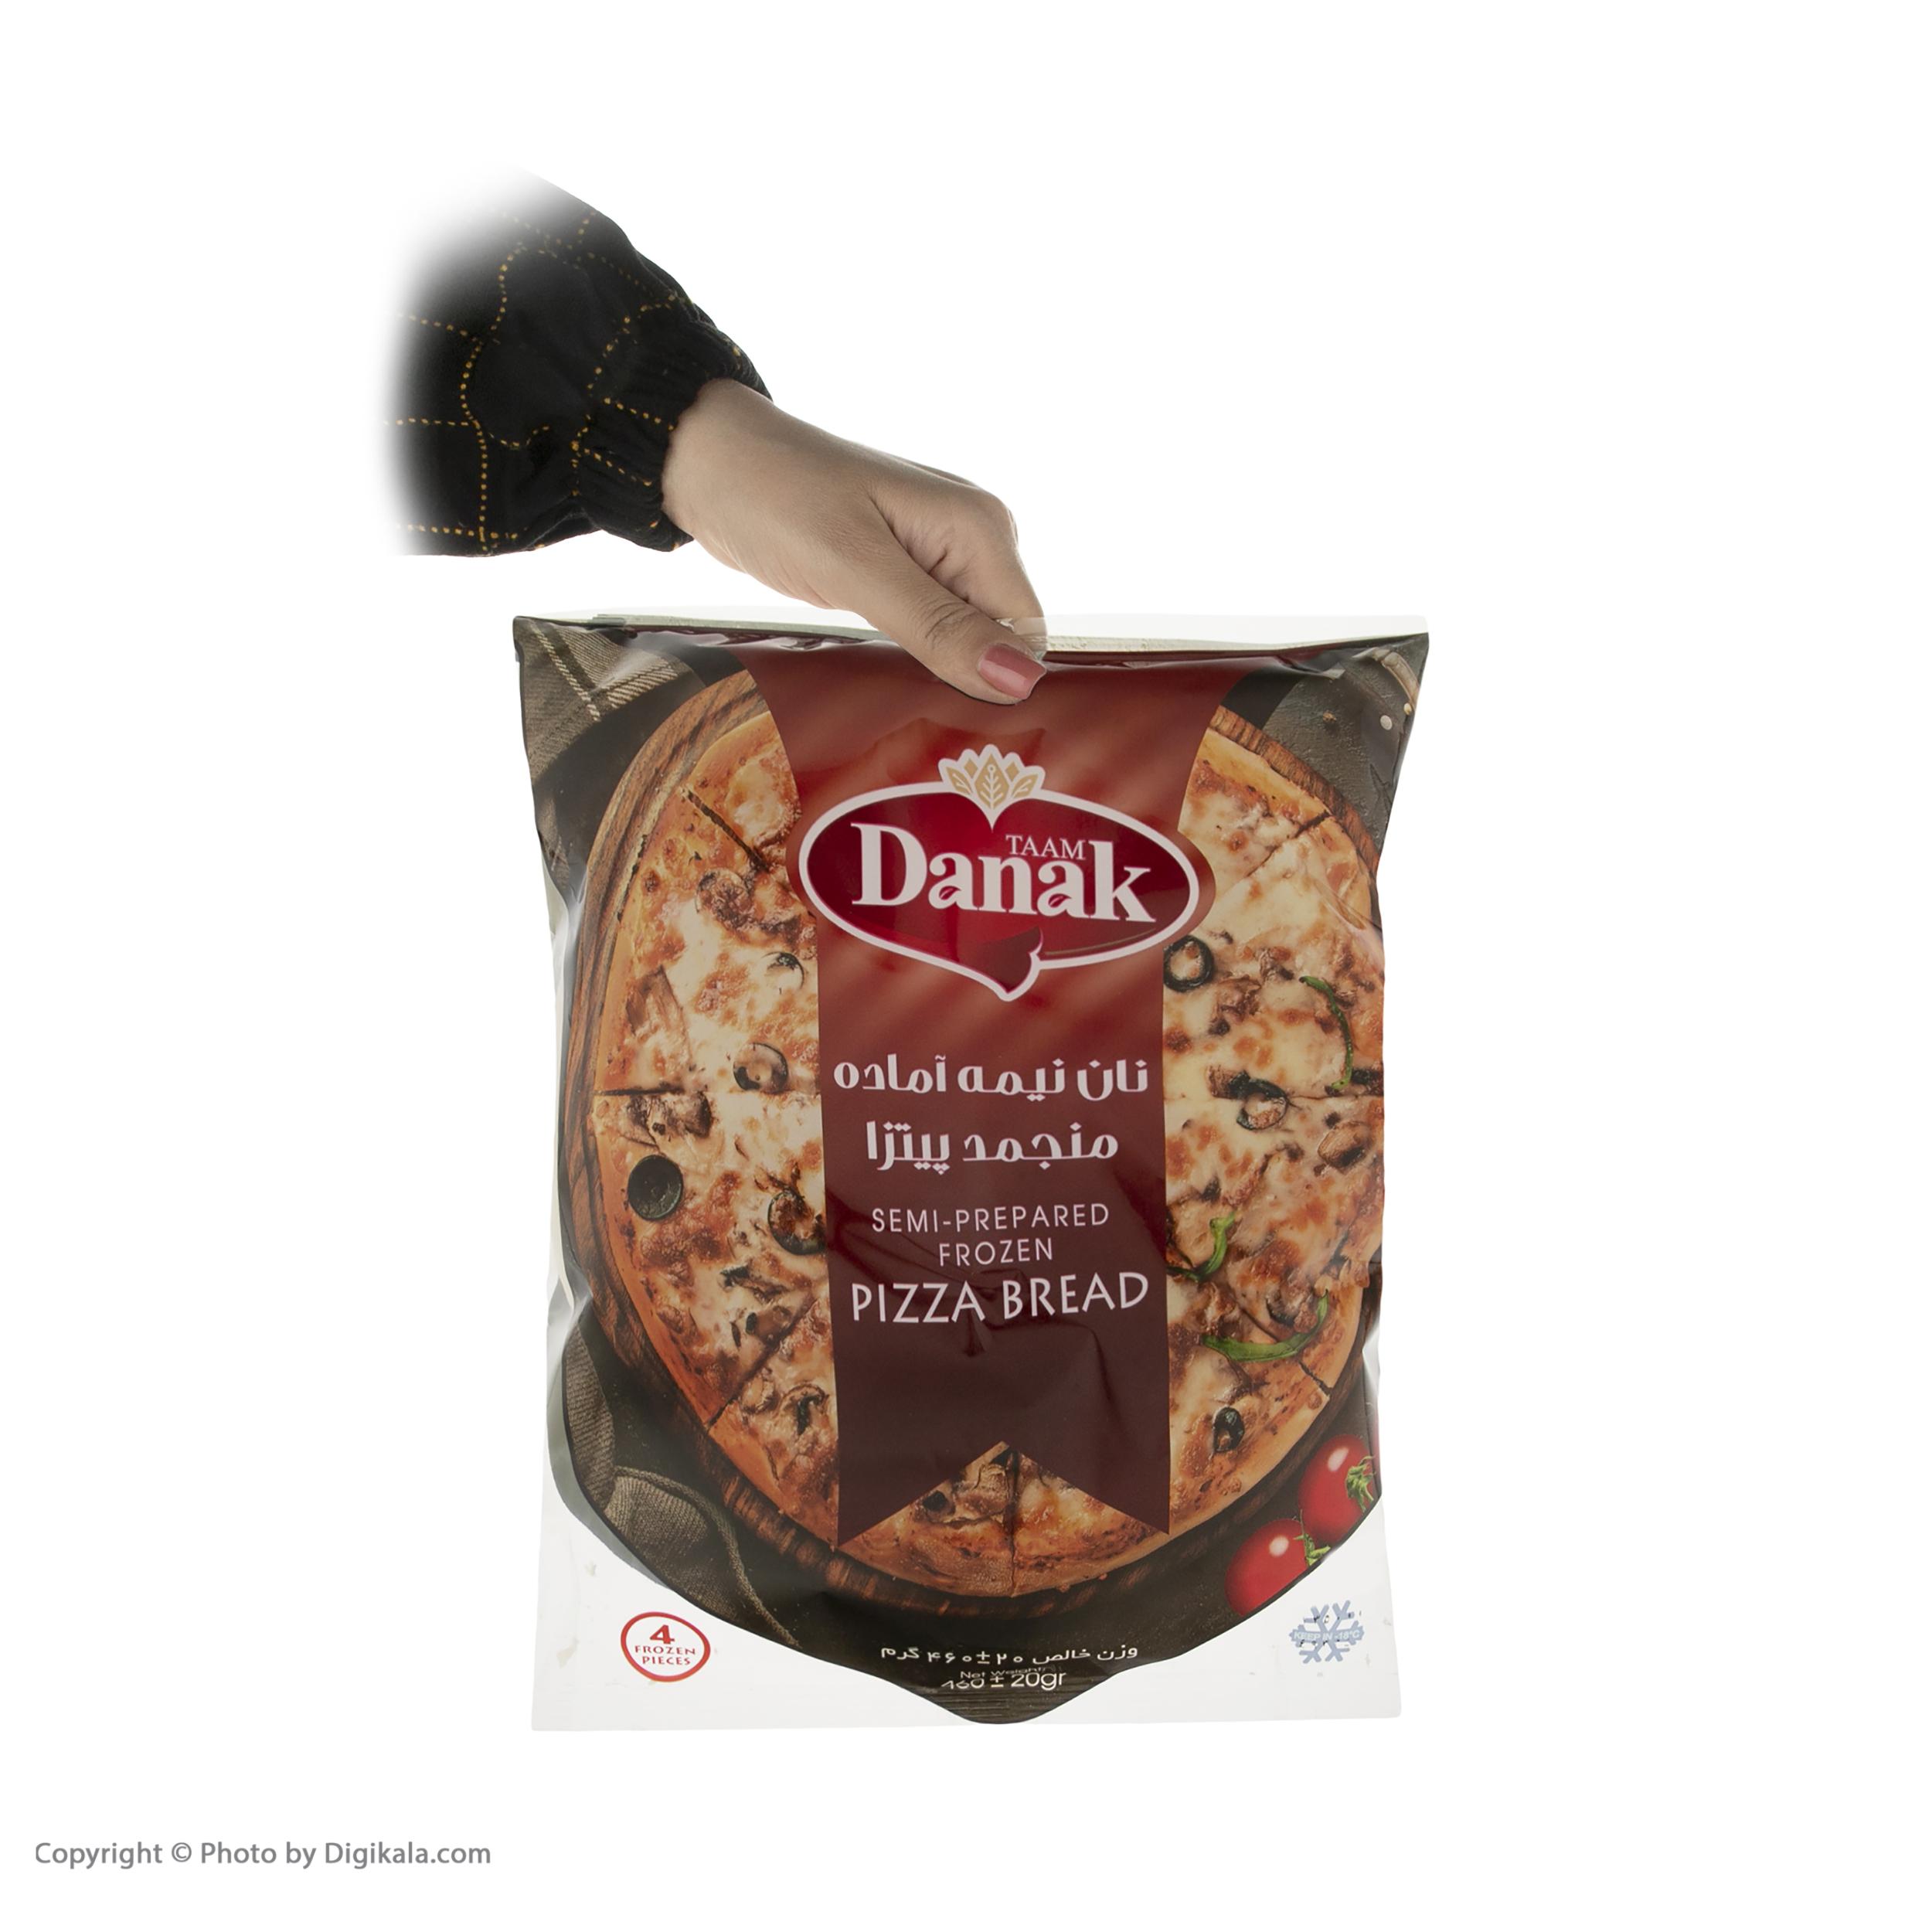 خمیر پیتزا داناک - 460 گرم main 1 2